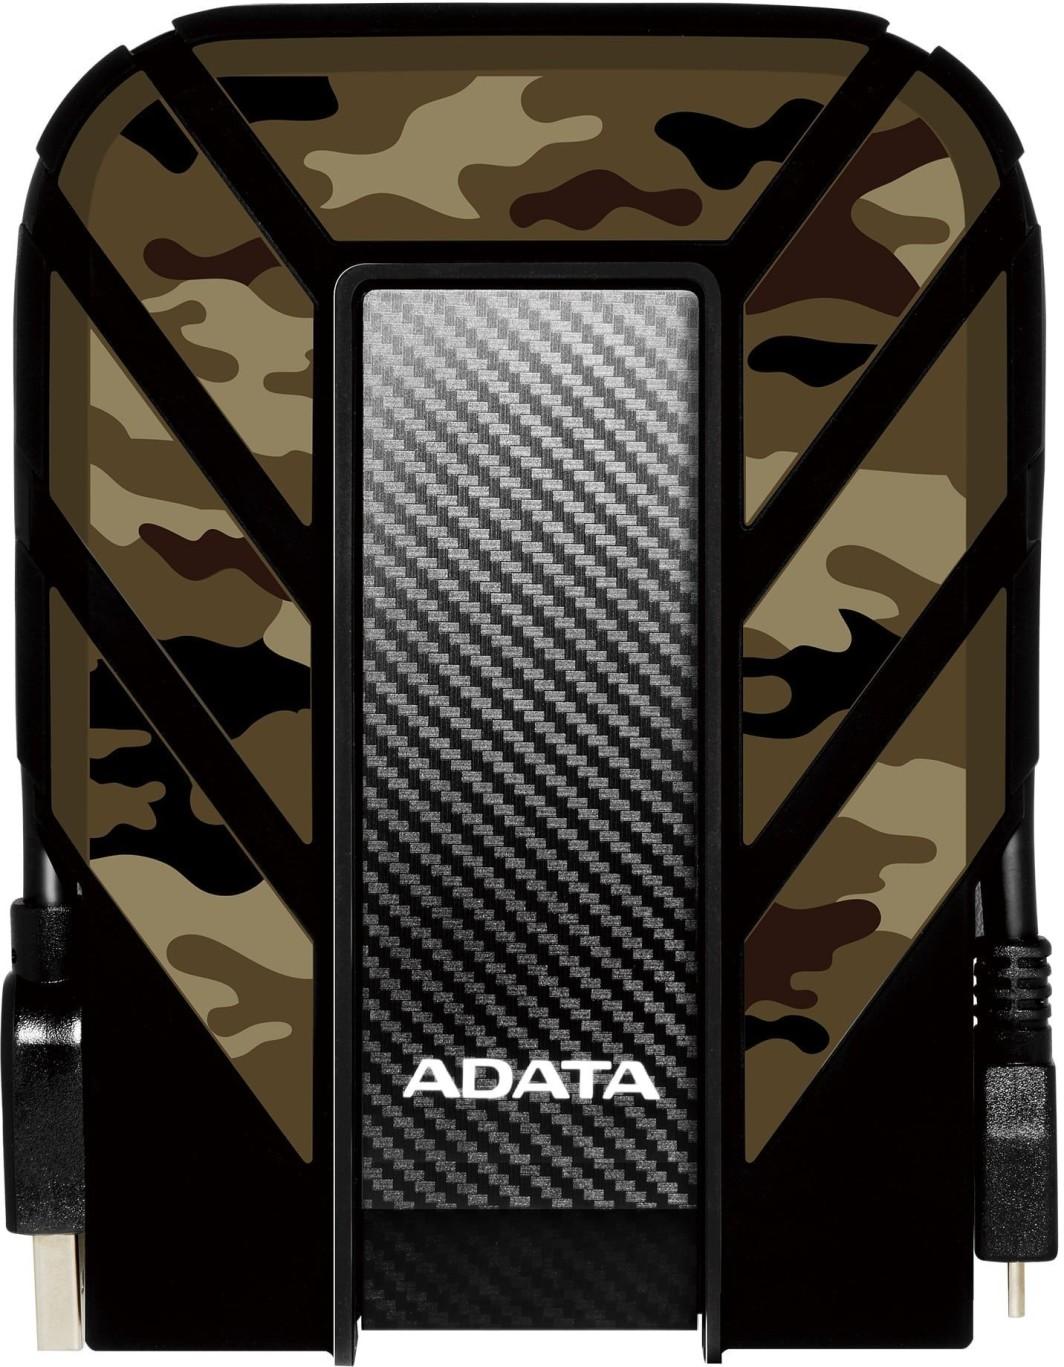 Dysk zewnętrzny ADATA HDD DashDrive Durable HD710M Pro 1 TB Czarny (AHD710MP-1TU31-CCF) 1